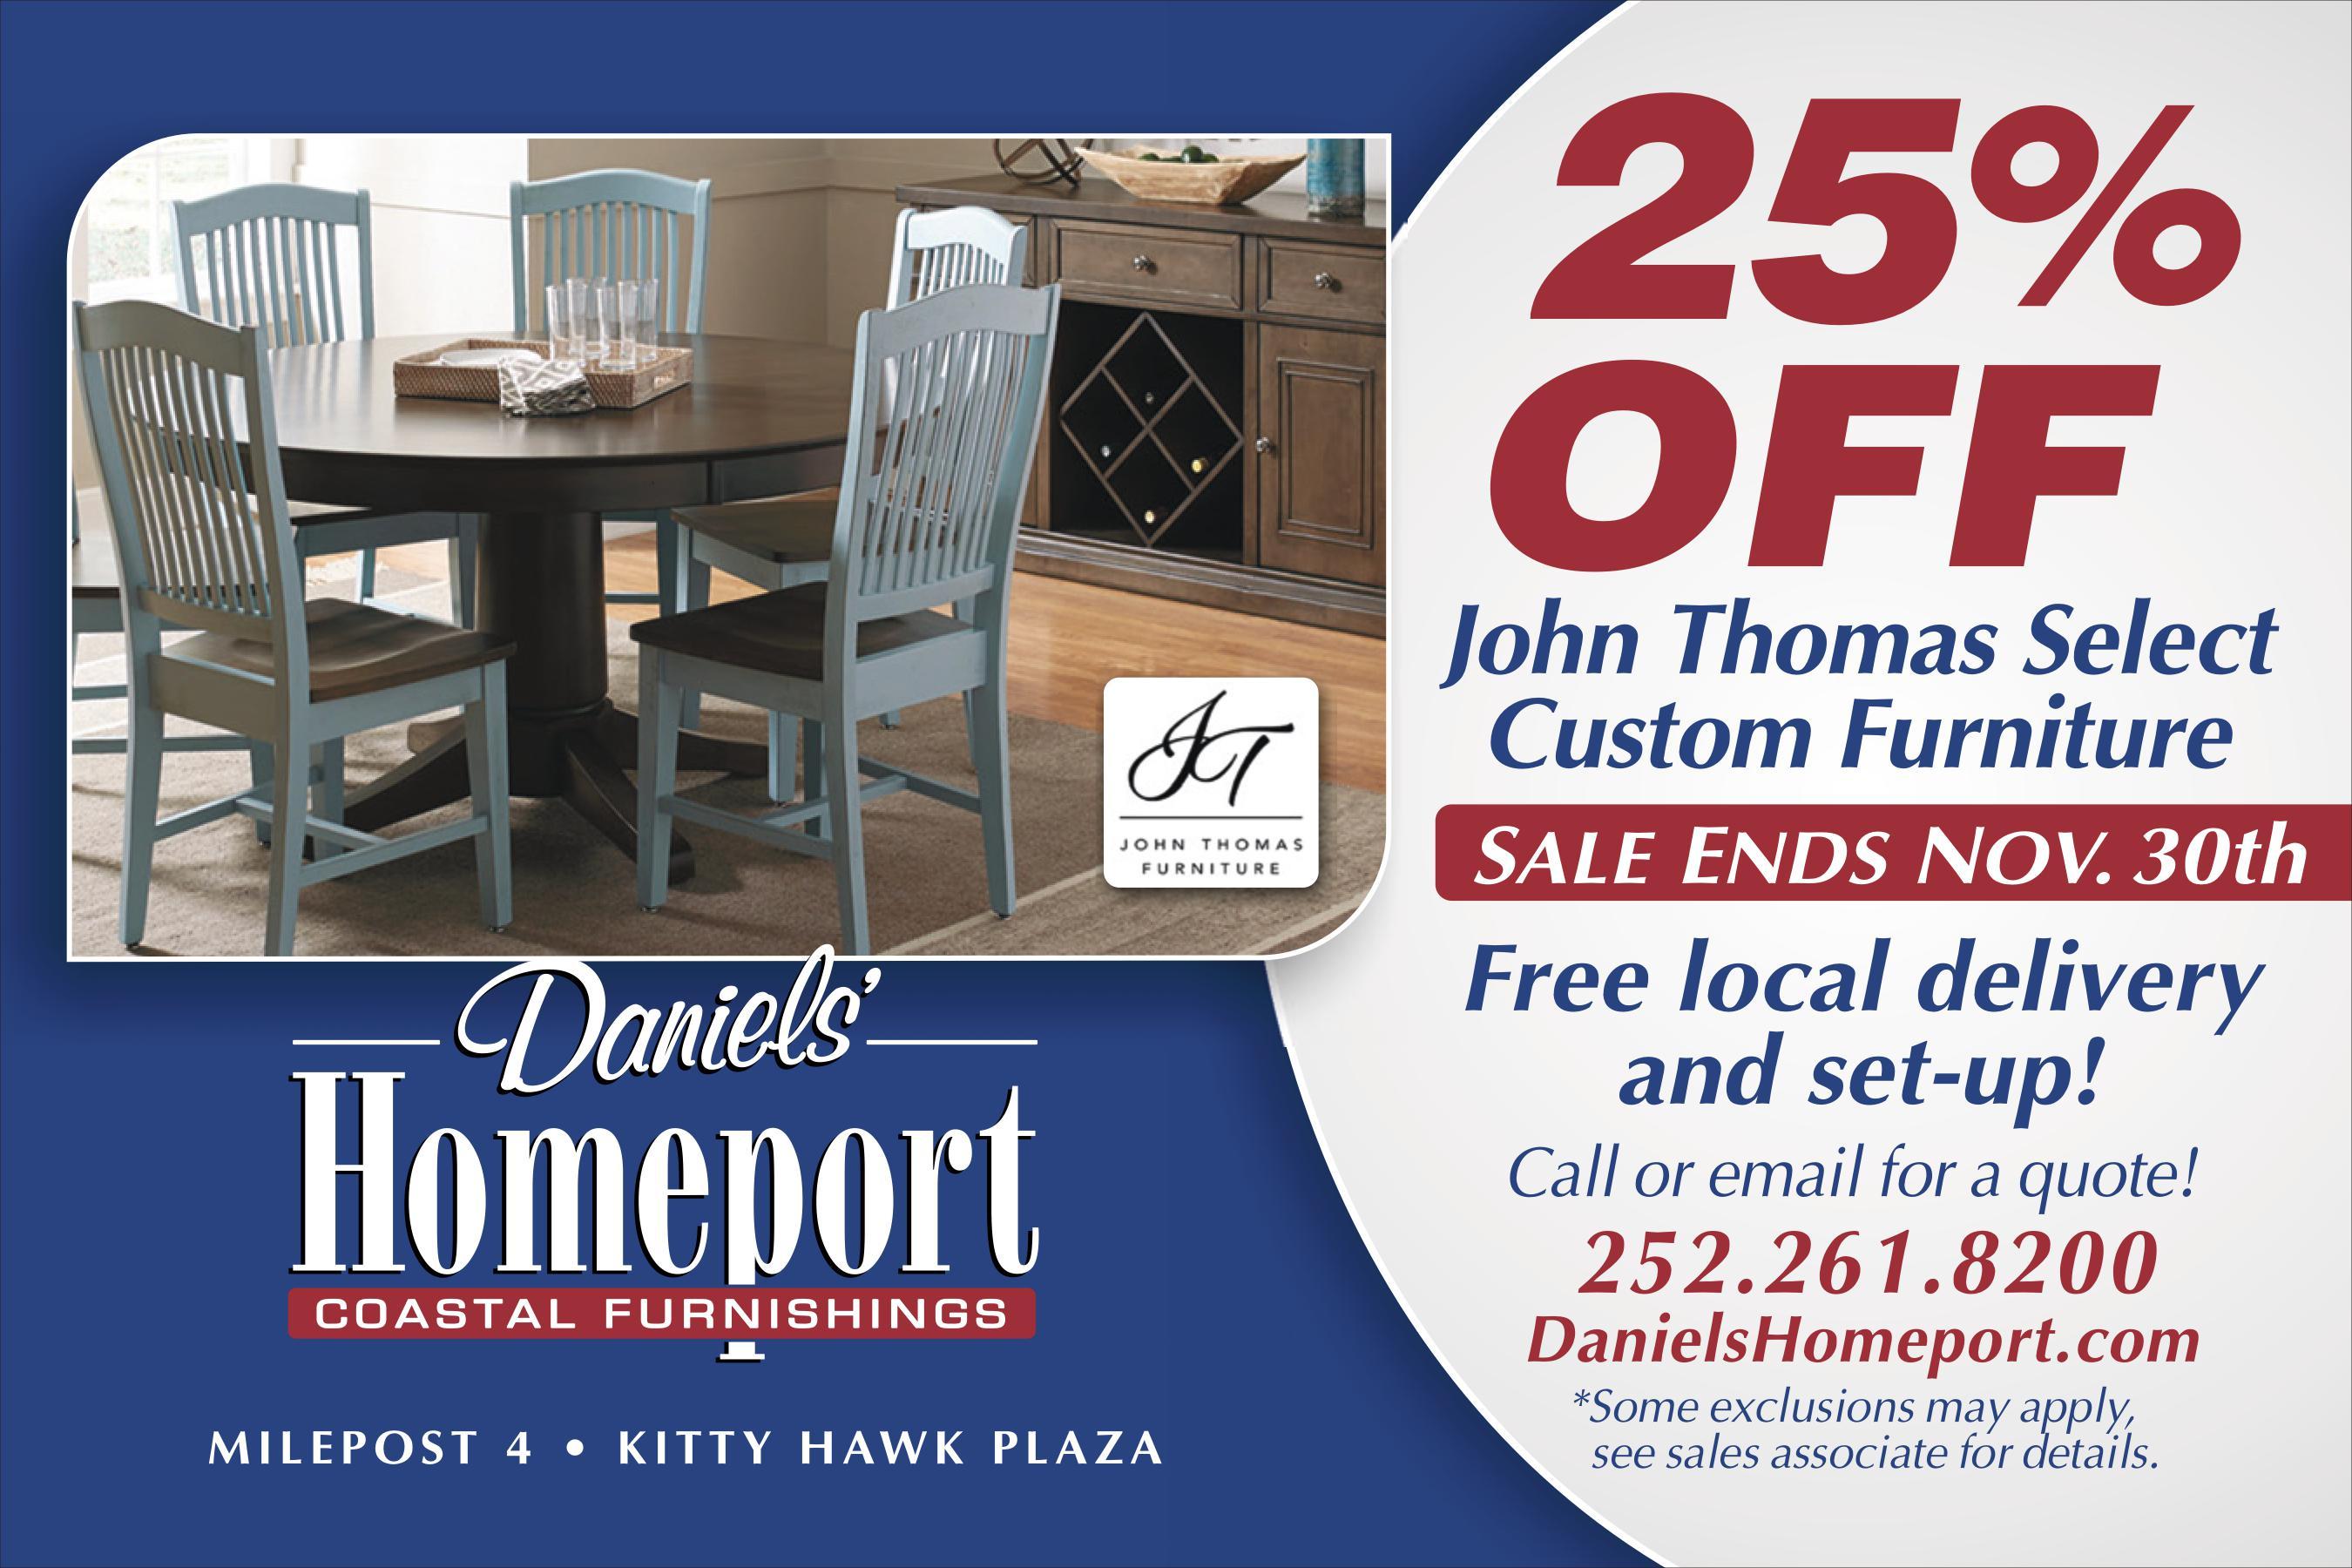 Daniels' Homeport Coastal Furnishings image 8